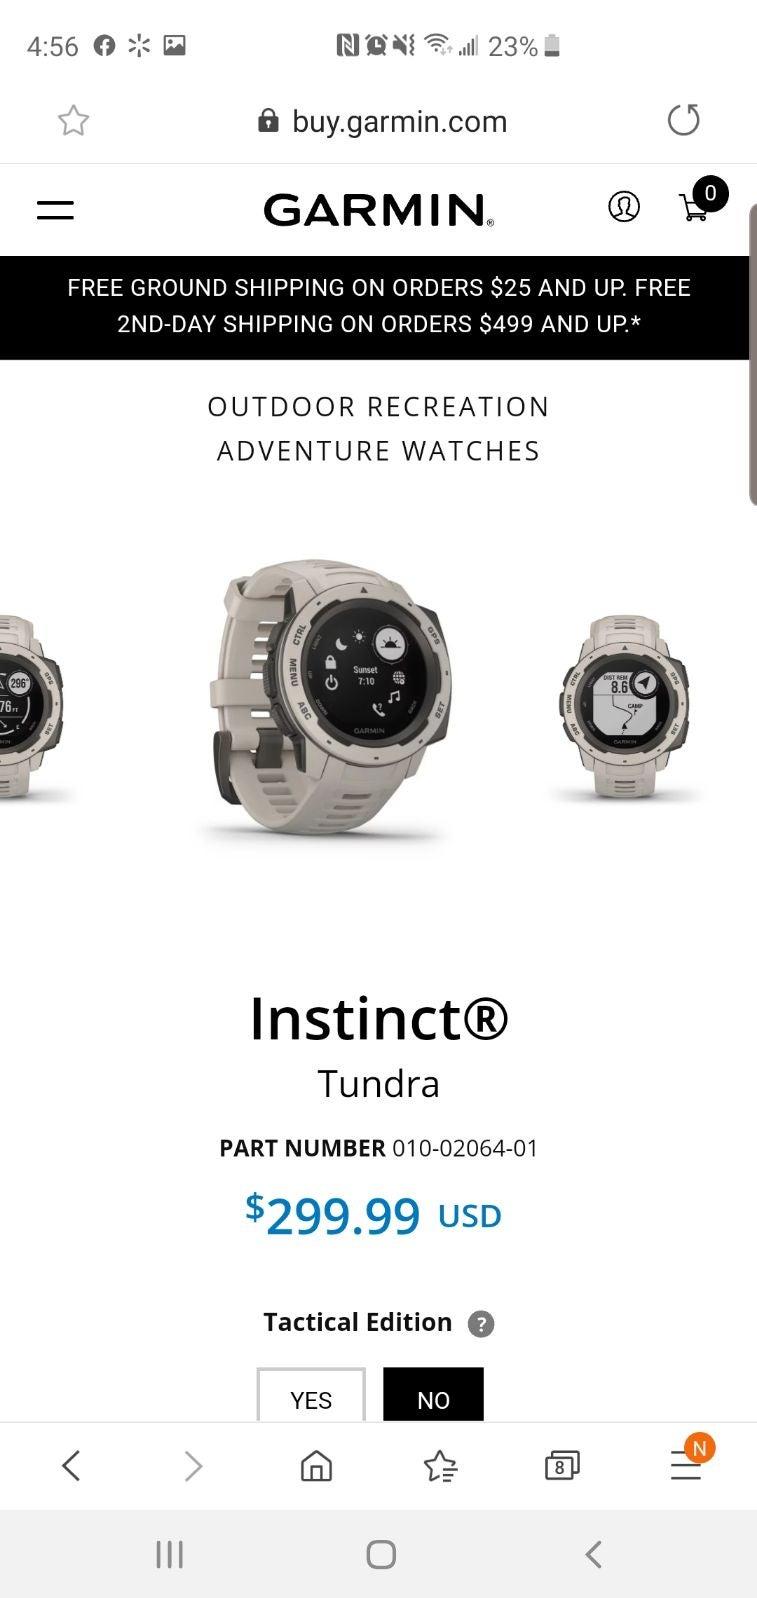 garmin watch instinct tactical tundra